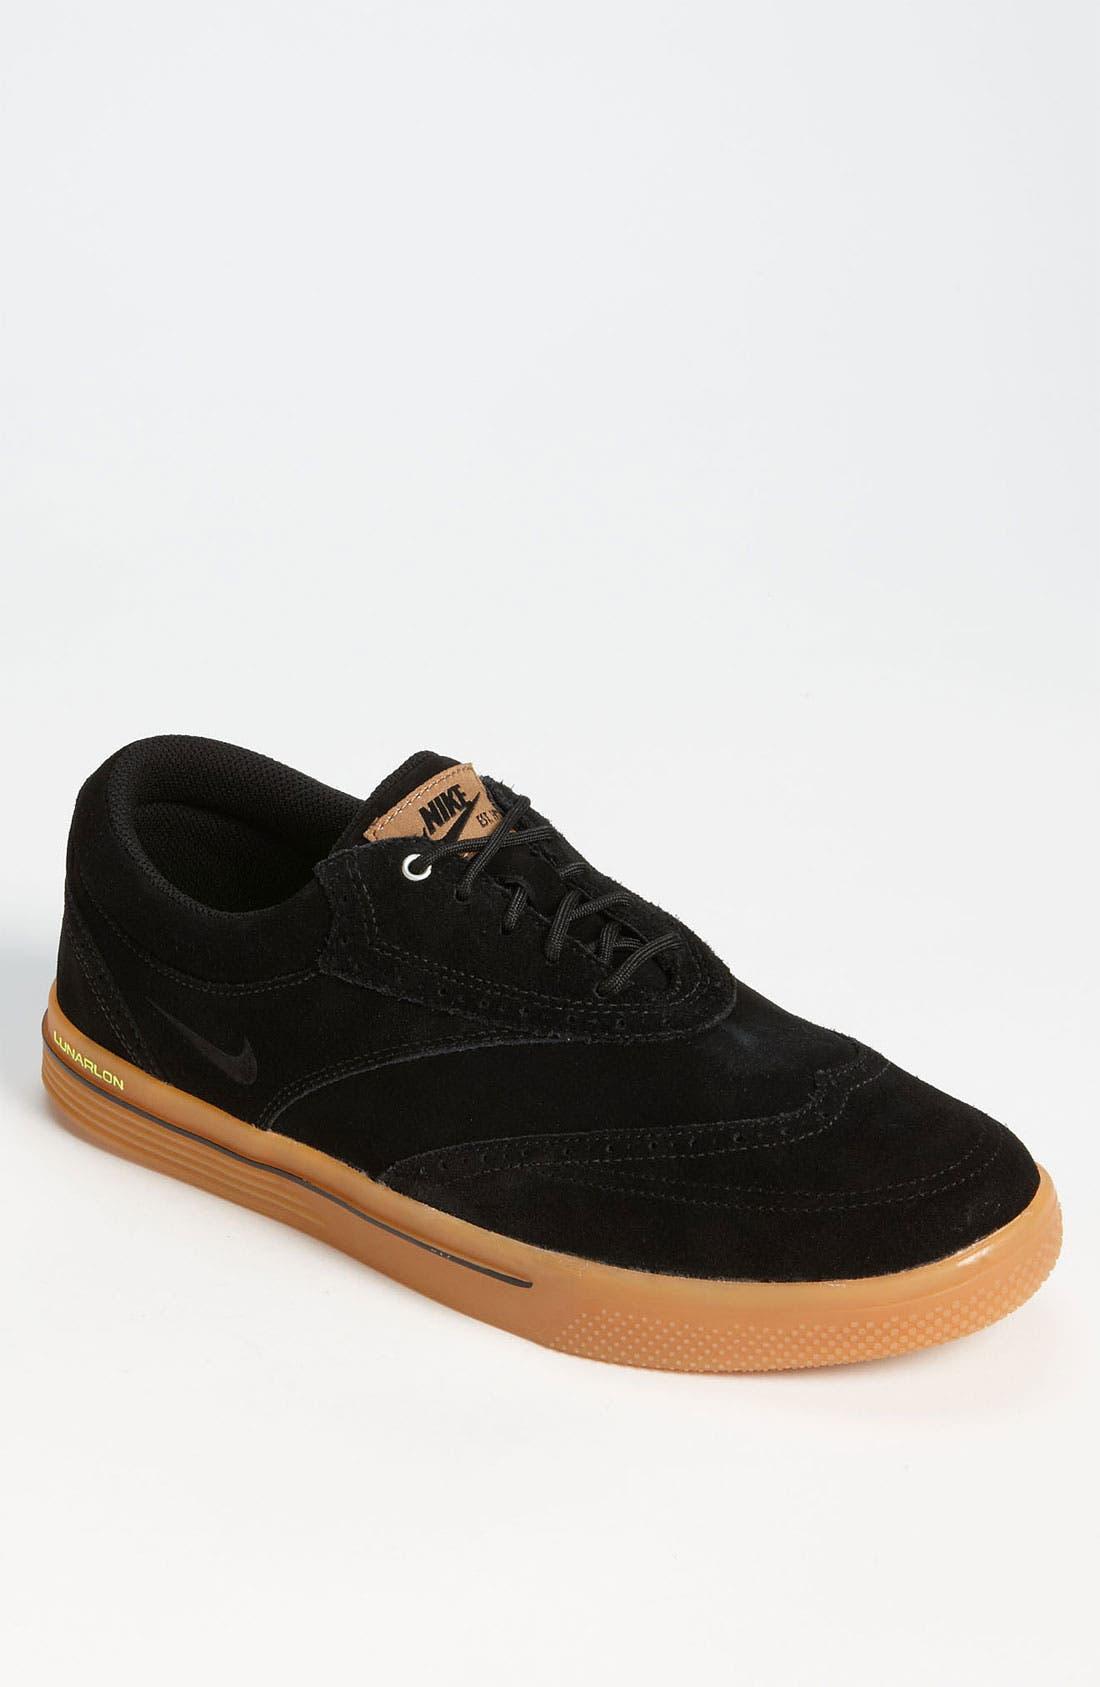 Main Image - Nike 'Lunar Swingtip' Suede Golf Shoe (Men)